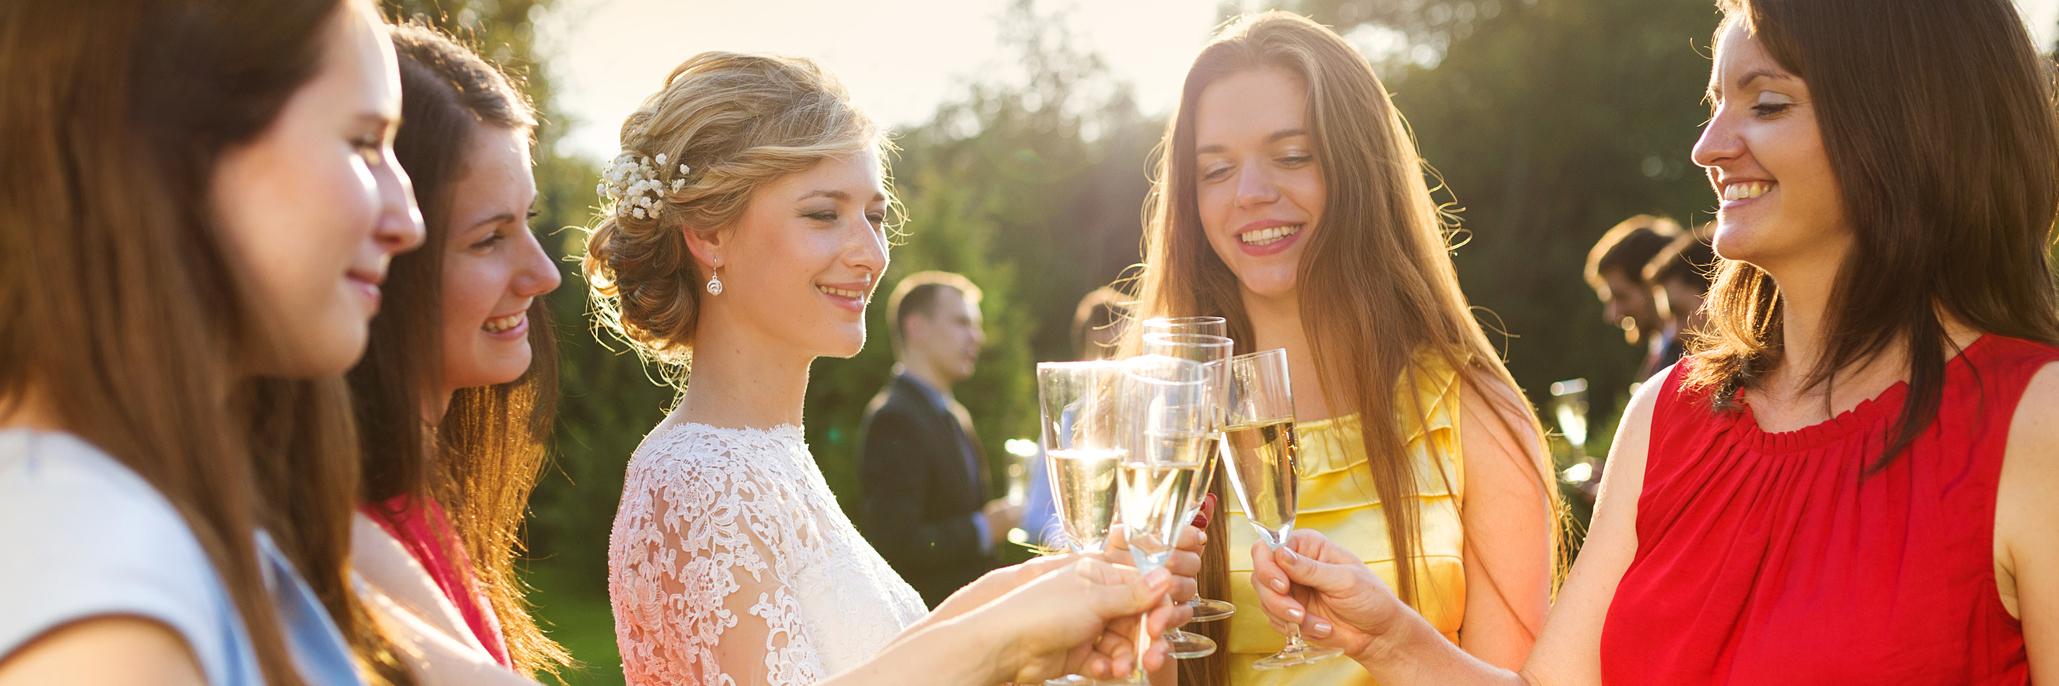 bride and bridesmaids clinking glasses at a wedding reception